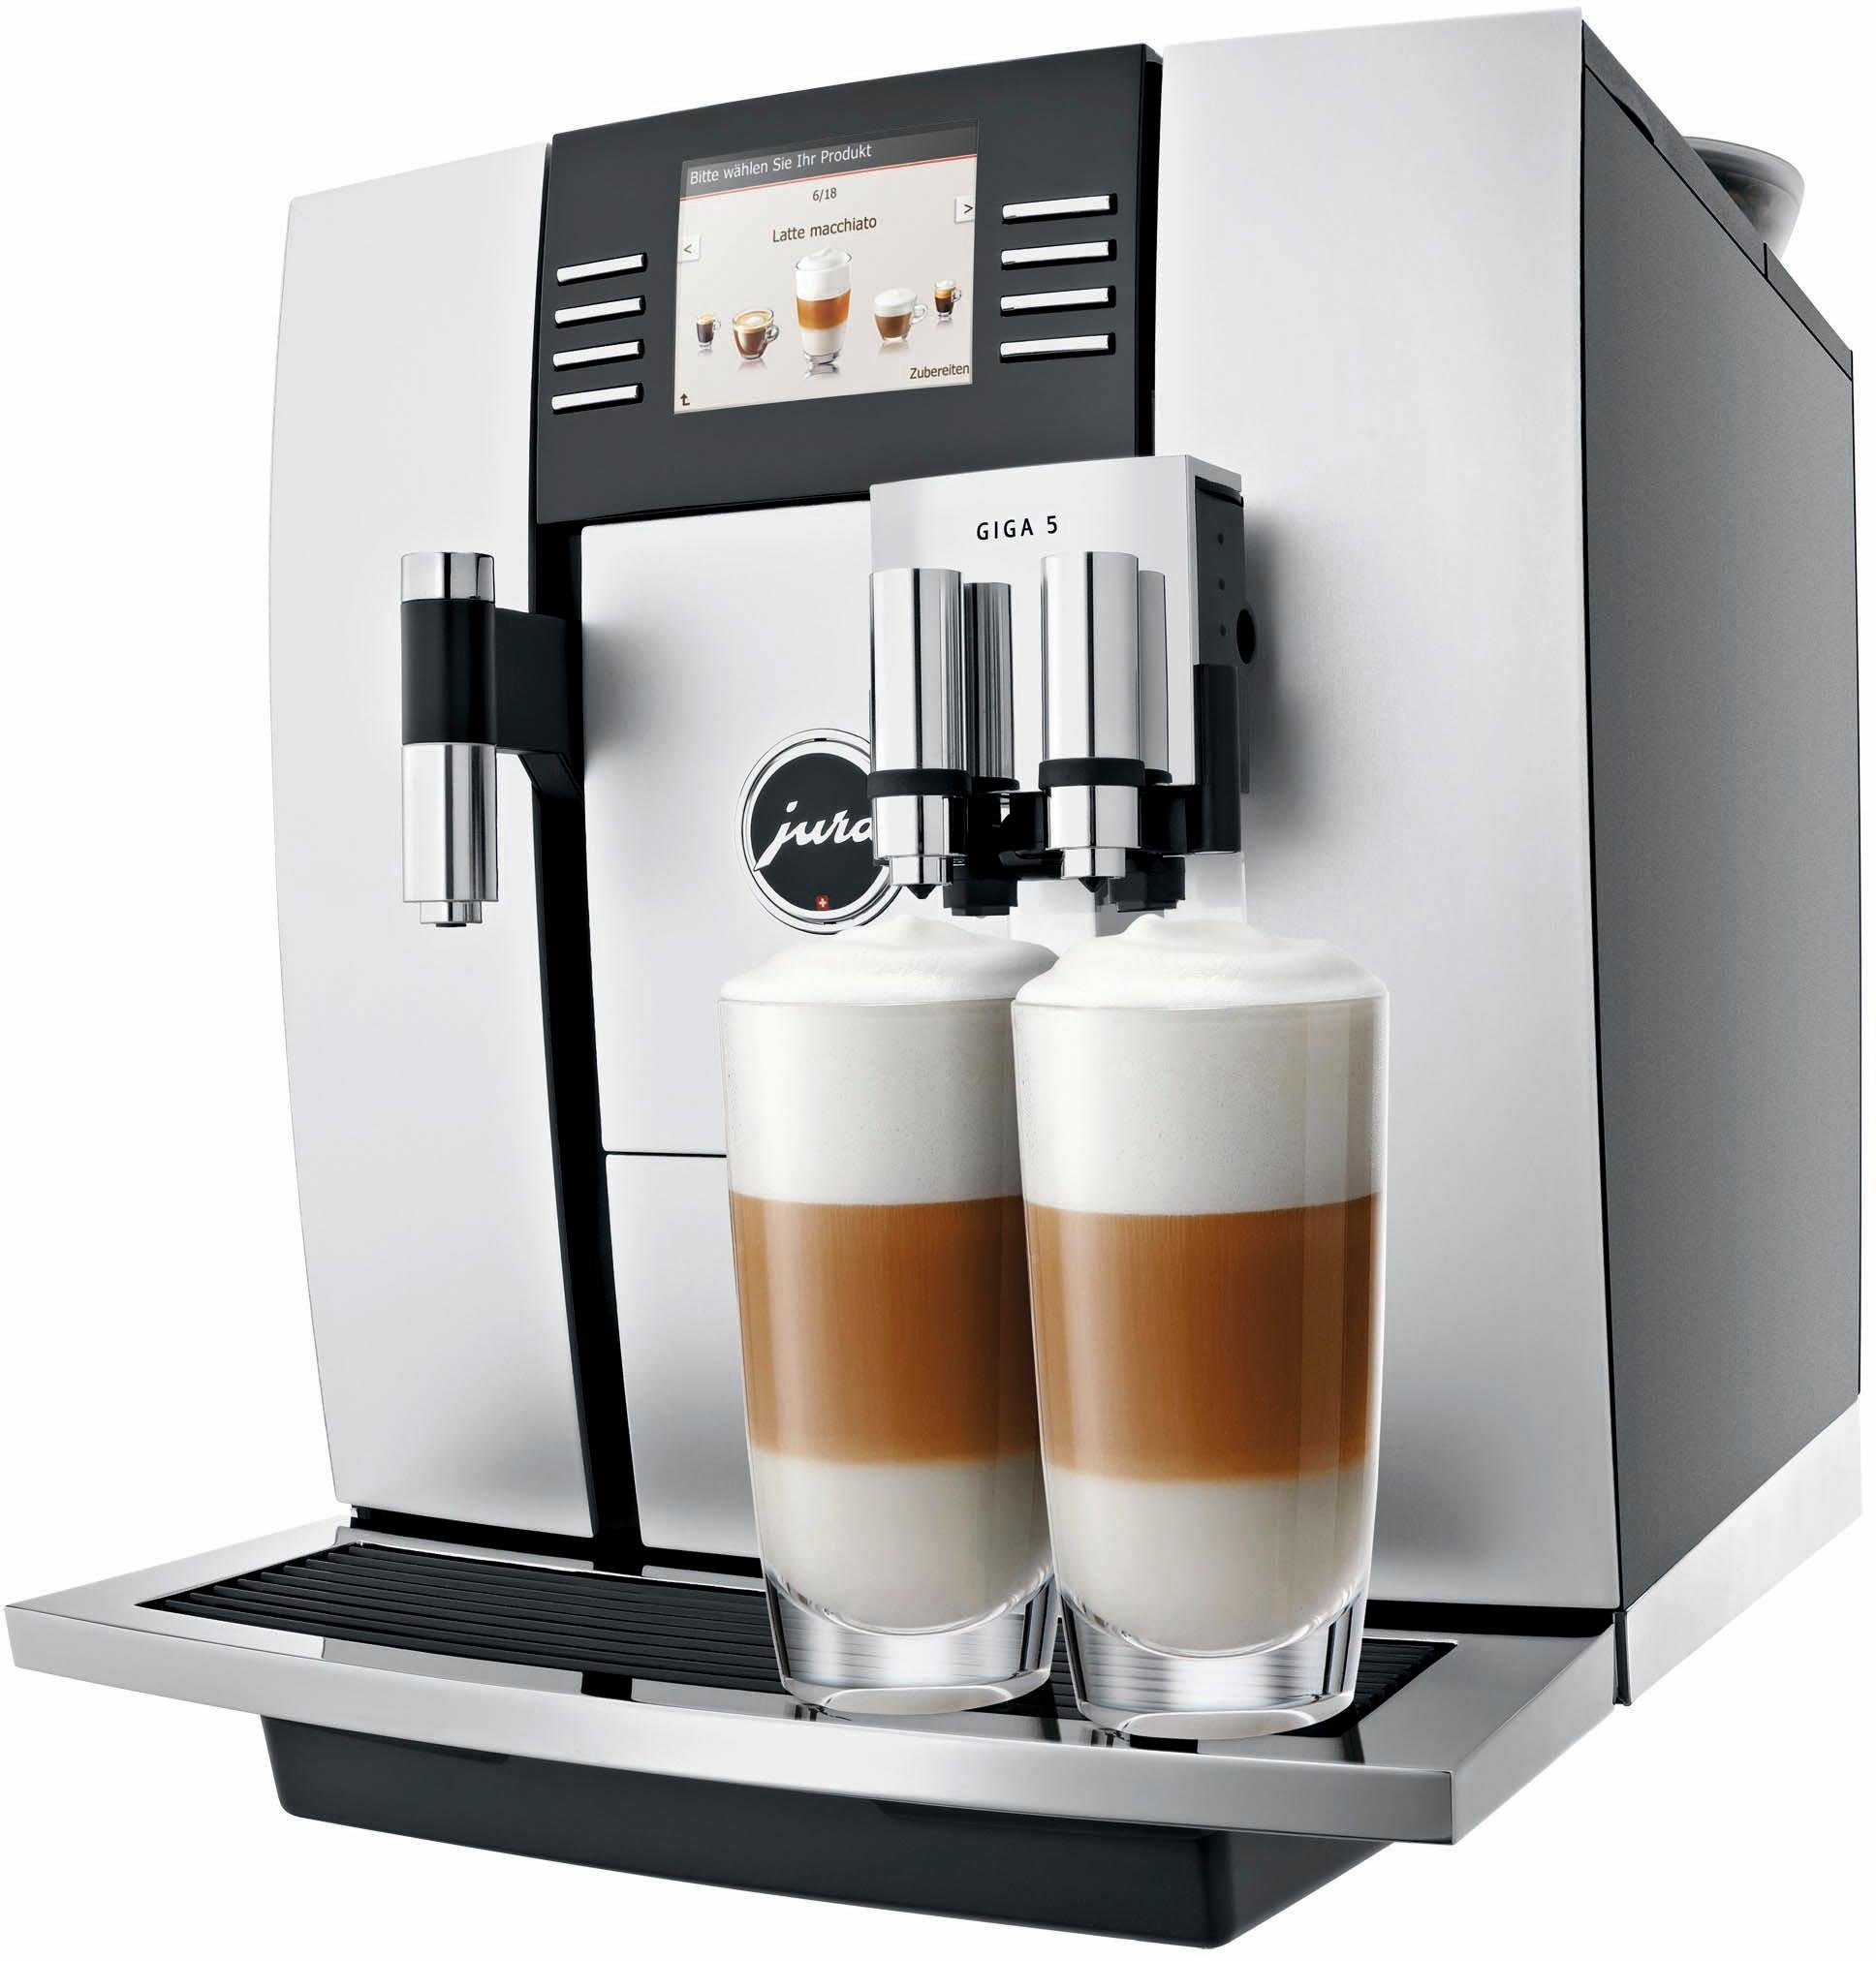 Jura Espresso-/Kaffee-Vollautomat GIGA 5, aluminium